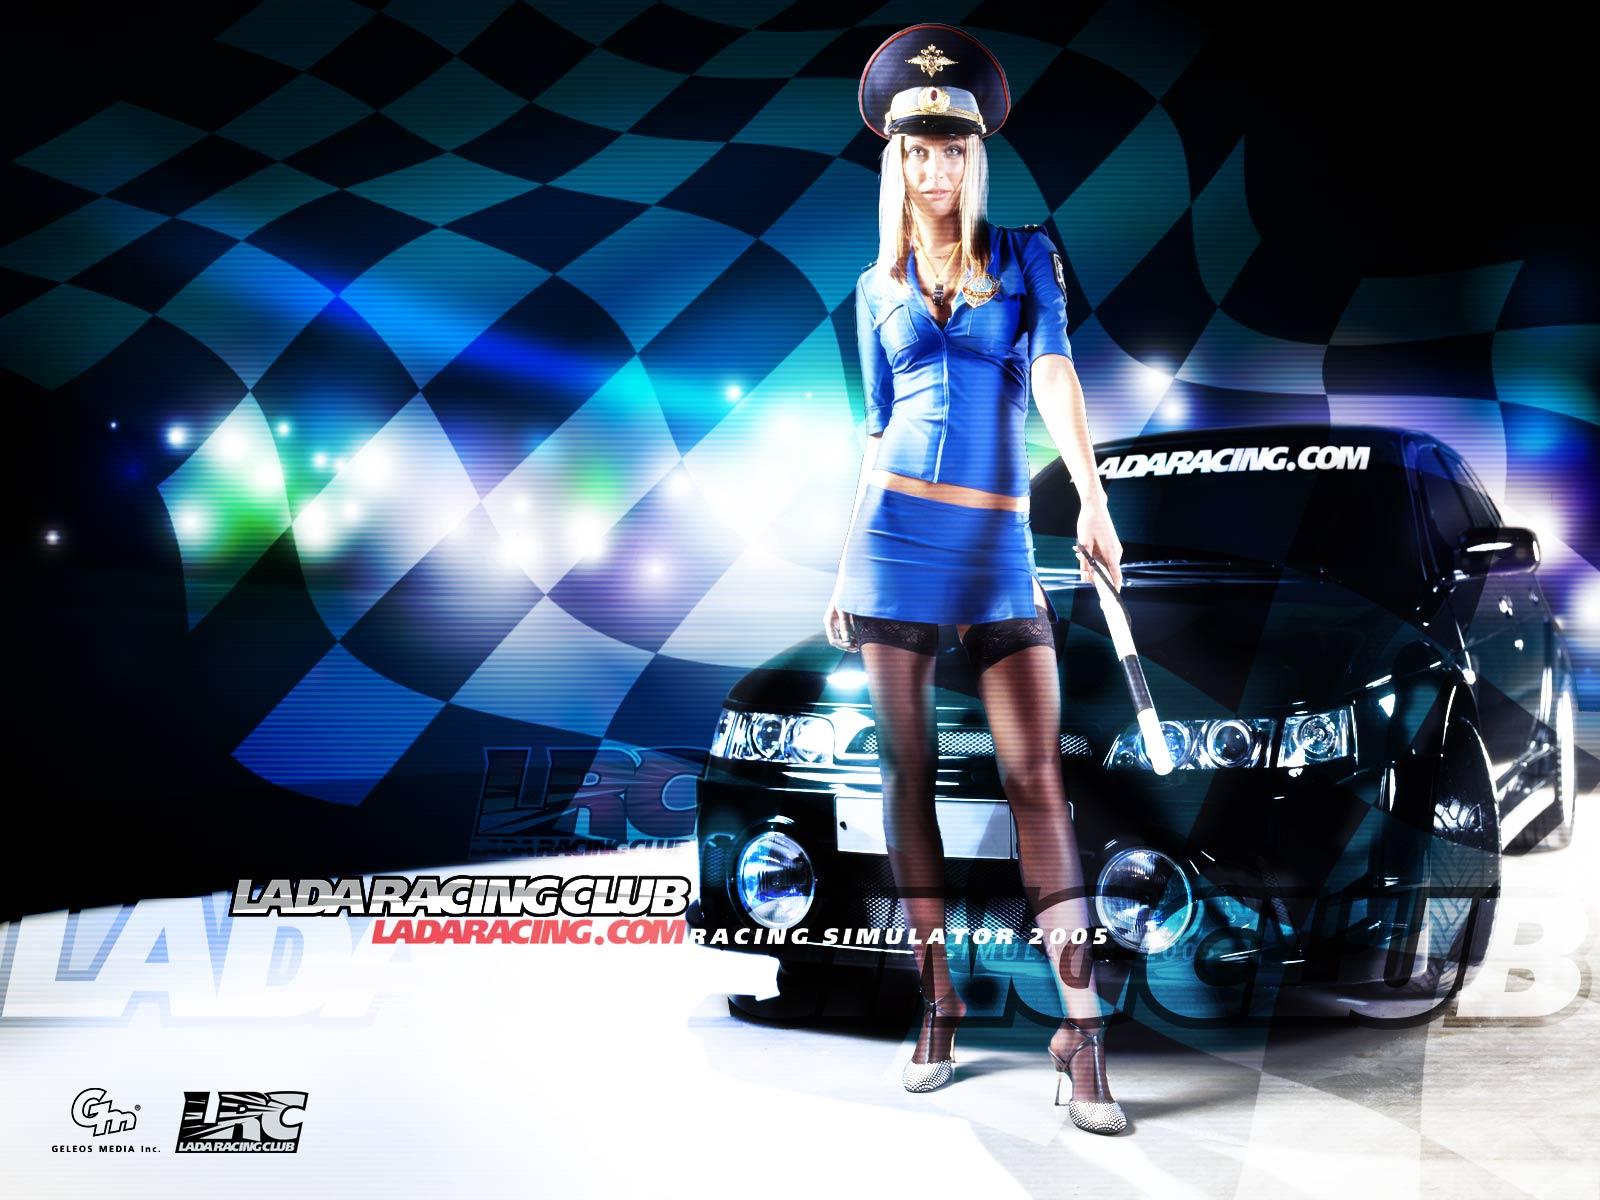 Games/wallpapers games Lada Racing Club 2. WallHits.com - World